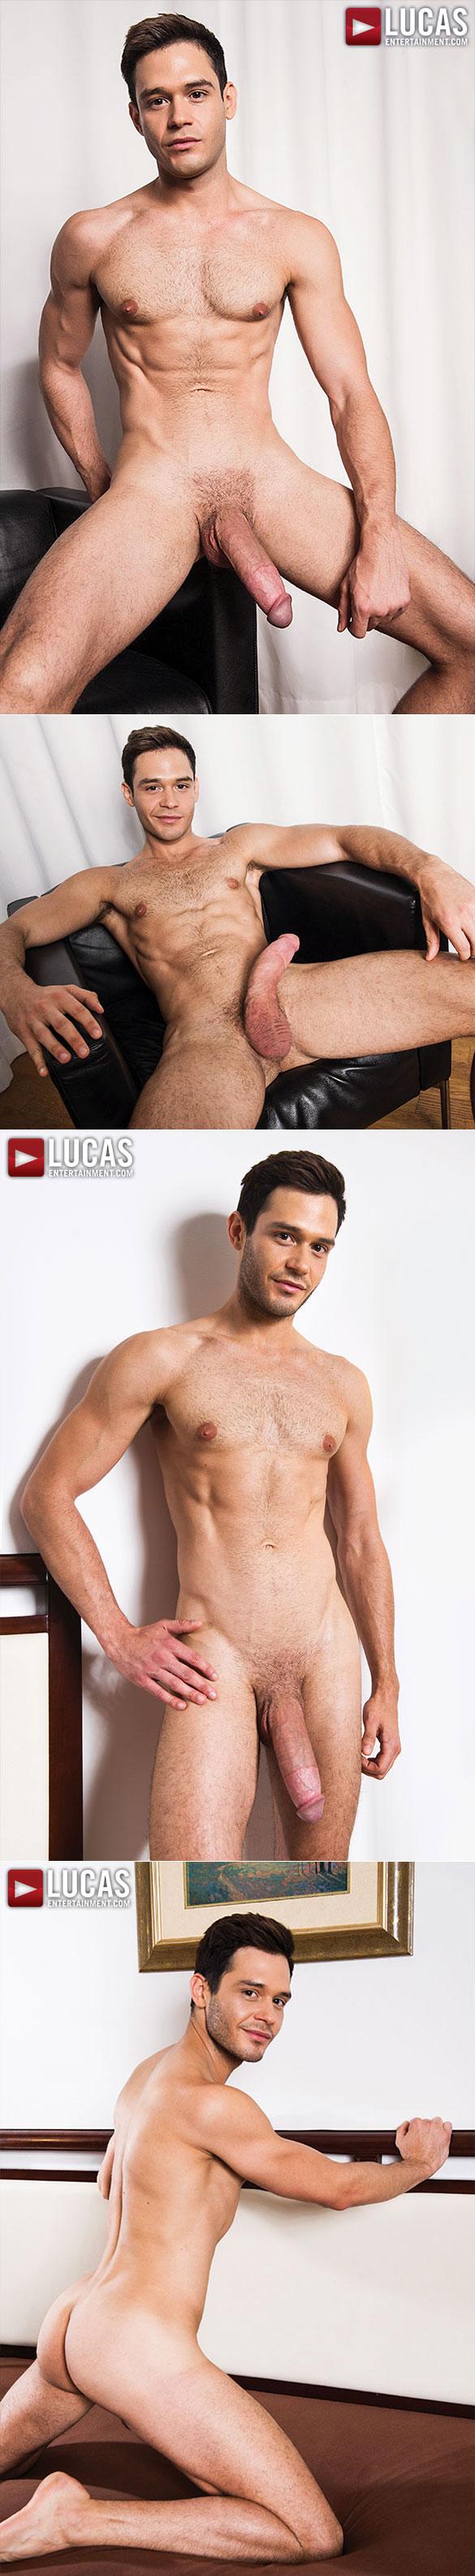 Lucas Entertainment: Leo Alexander and Tomas Brand's raw flip-fuck